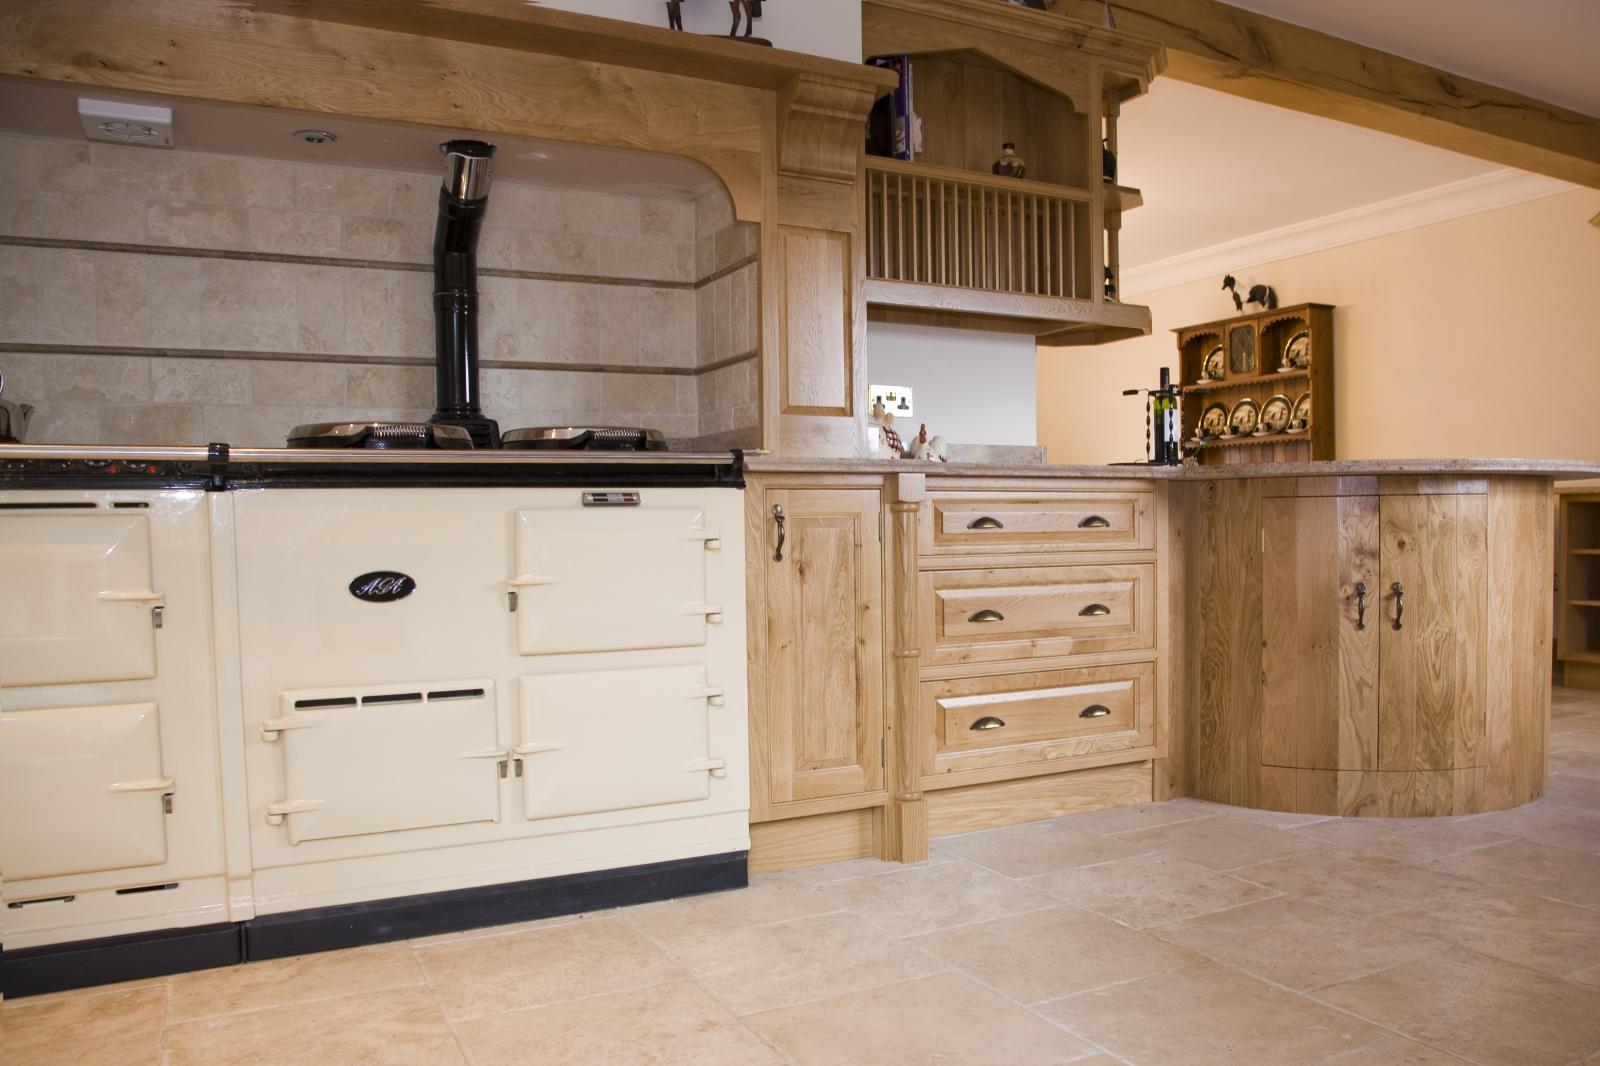 Oak Kitchens From Mark Stones Welsh Kitchens